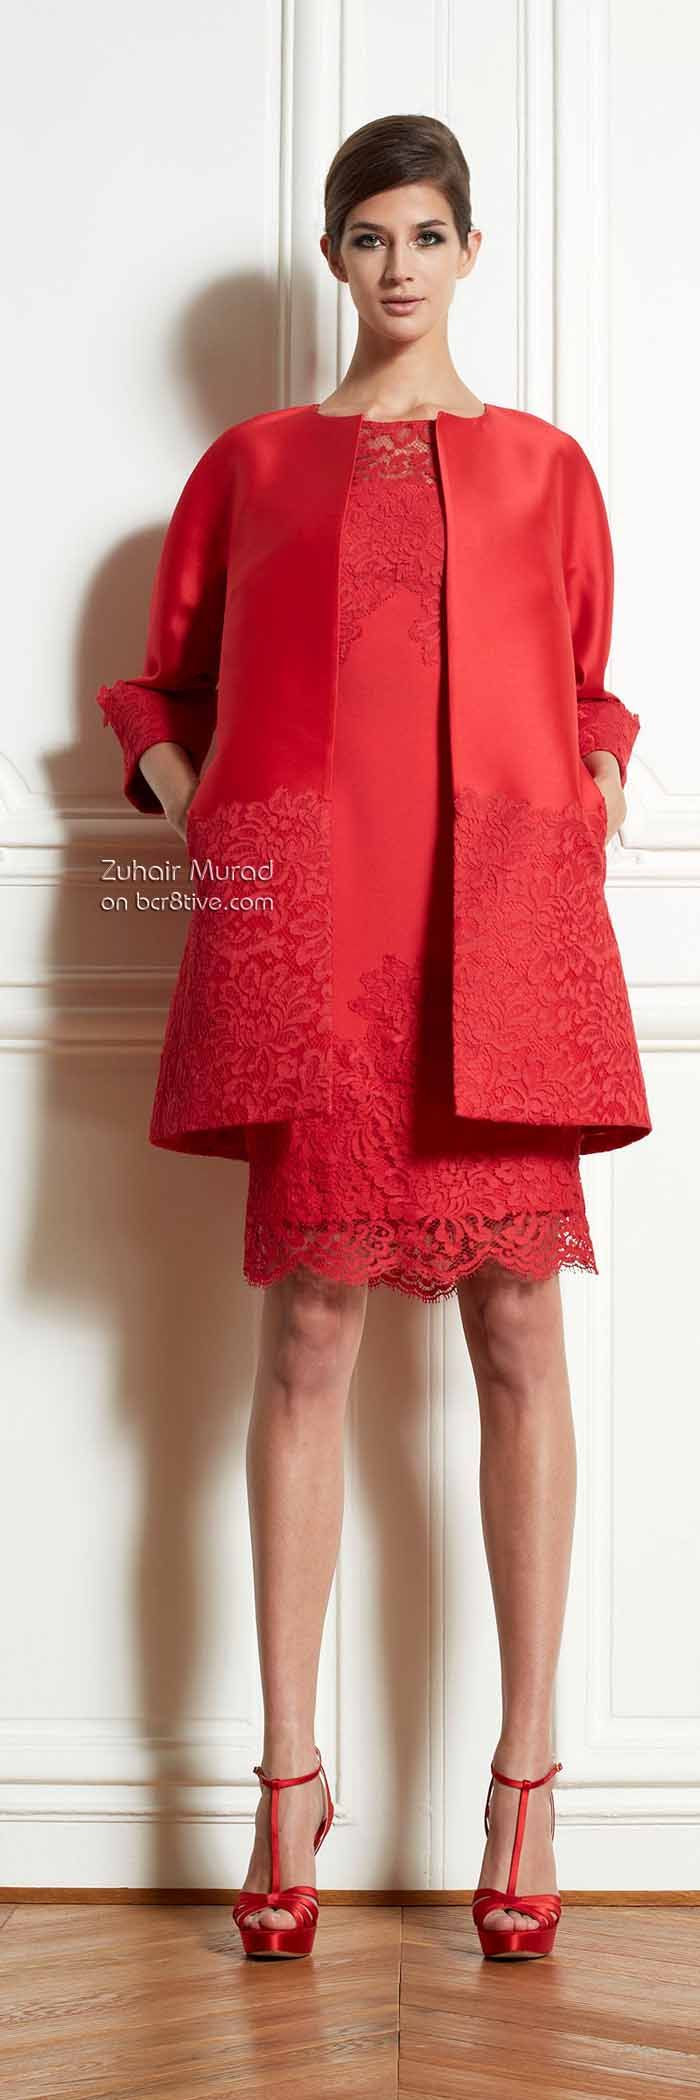 Zuhair Murad Spring Summer 2013 Ready to Wear